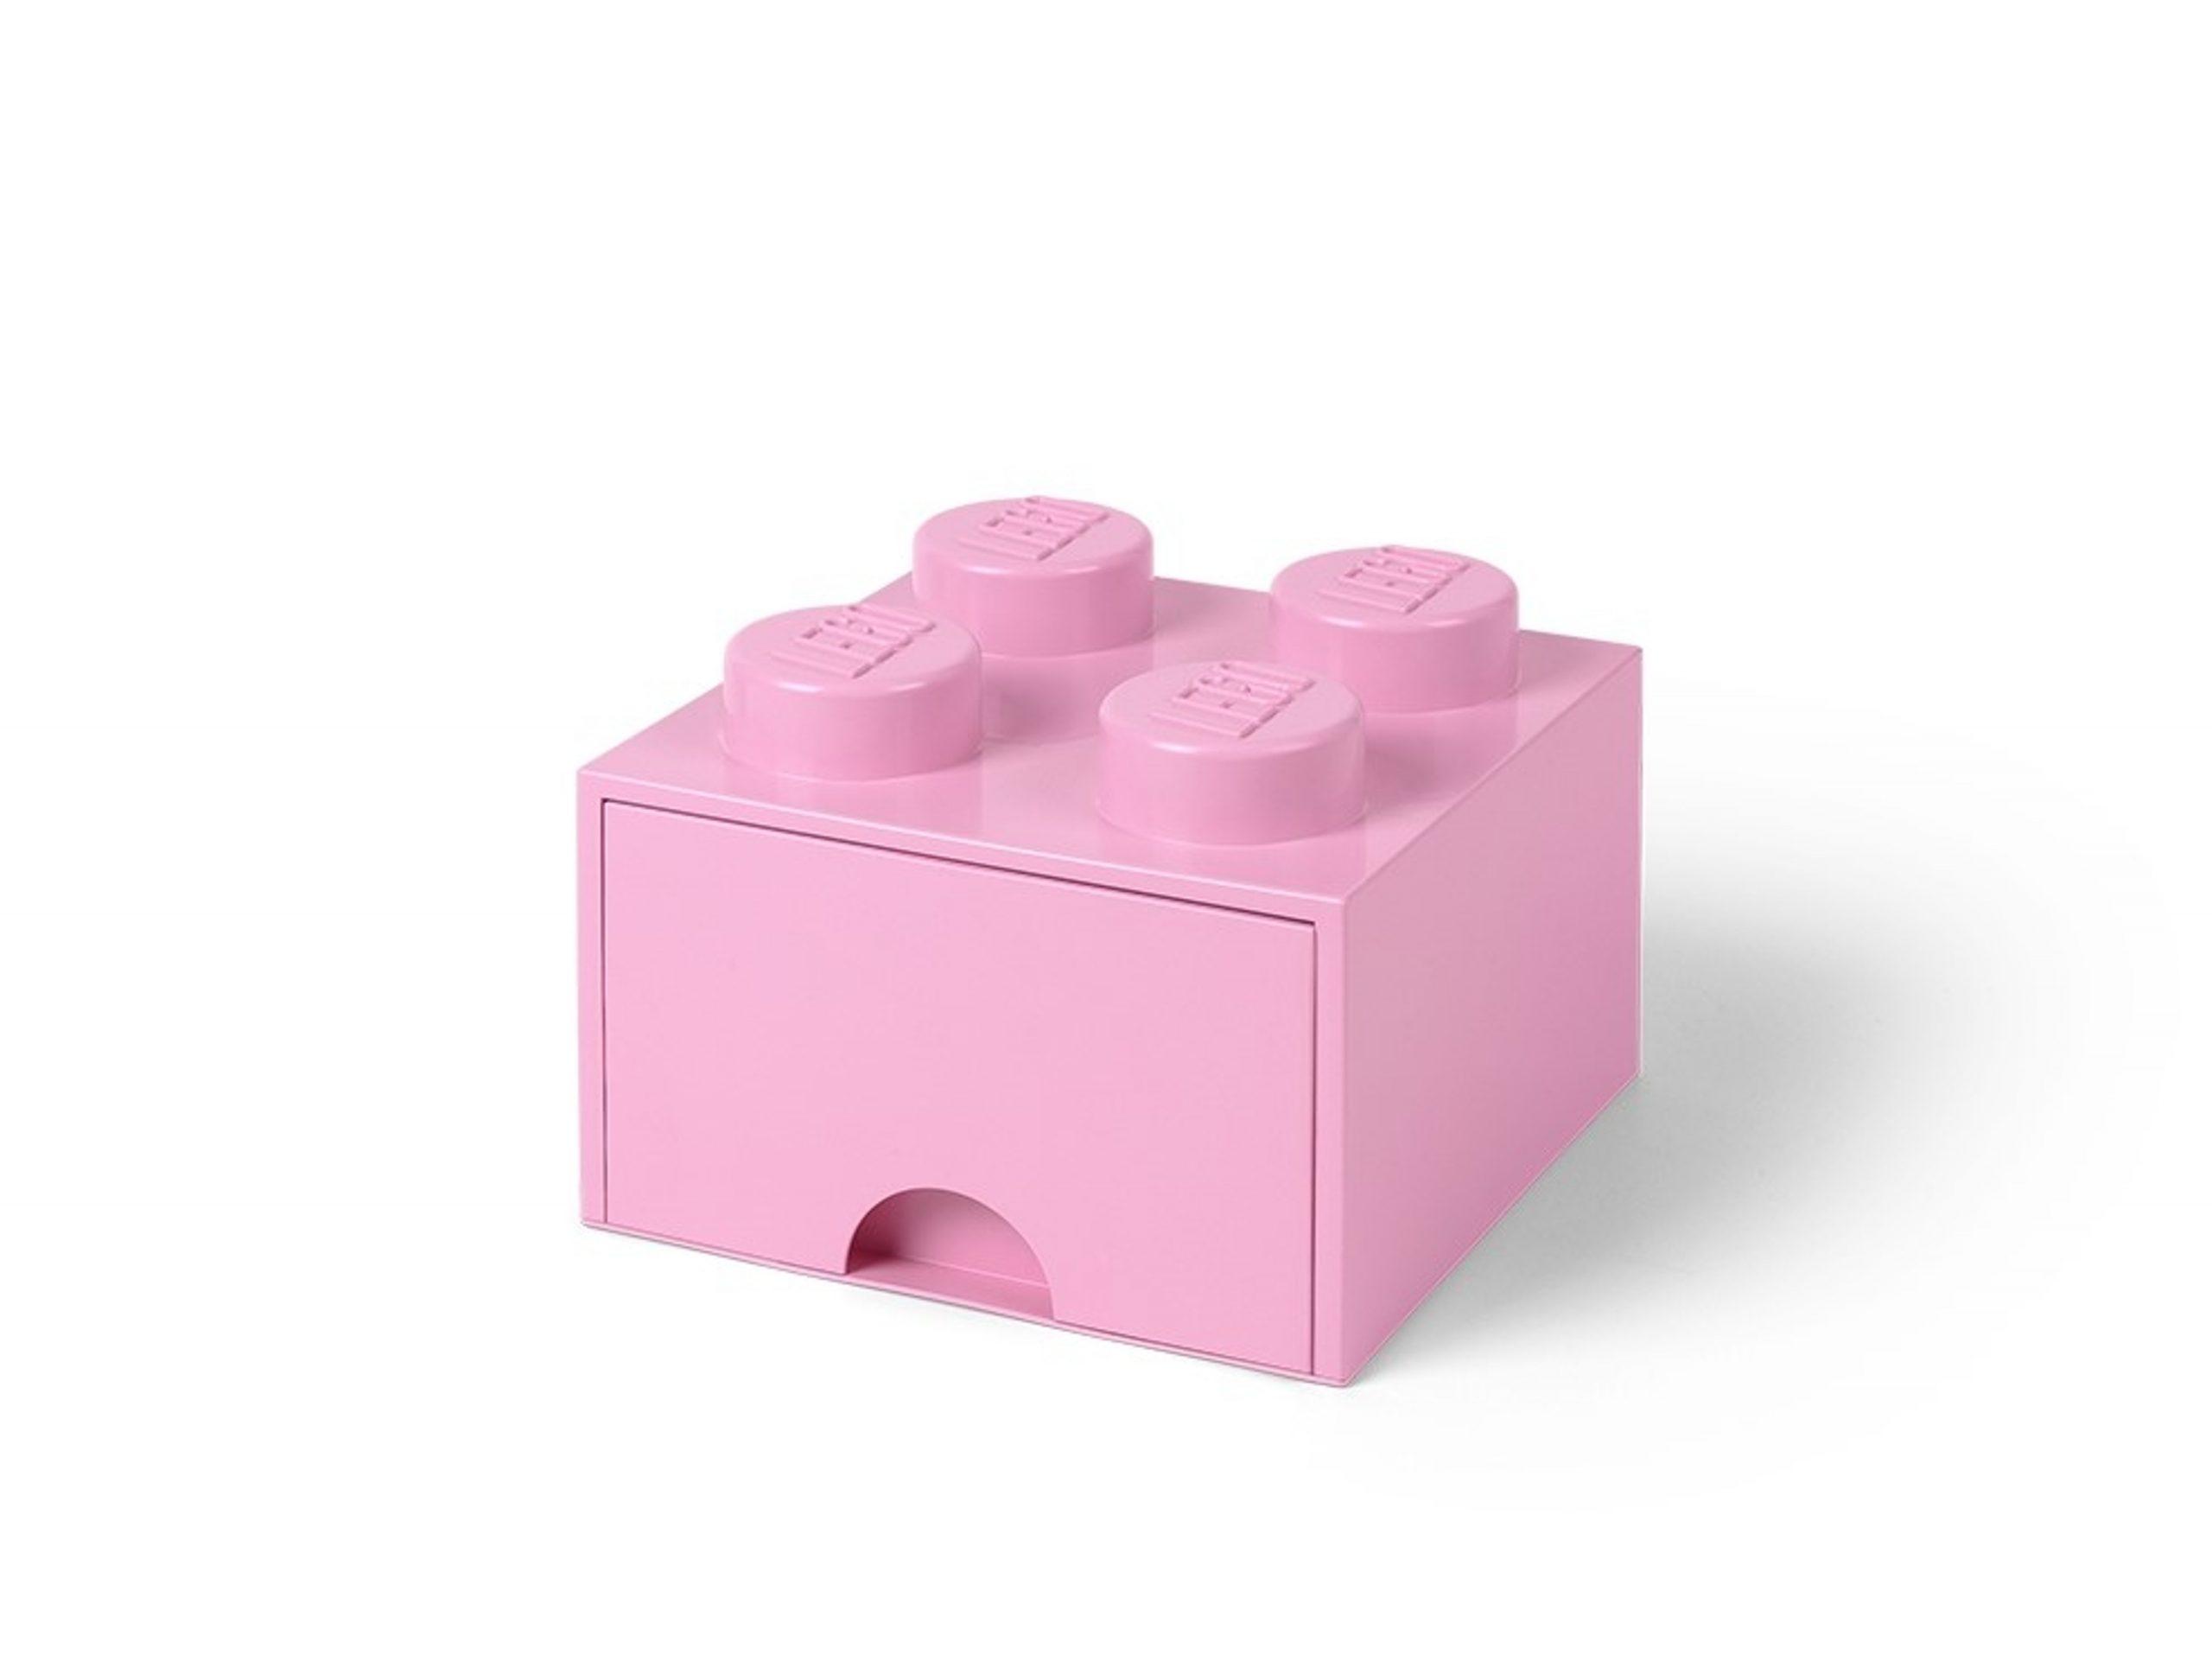 lego 5005712 4 stud light purple storage brick drawer scaled